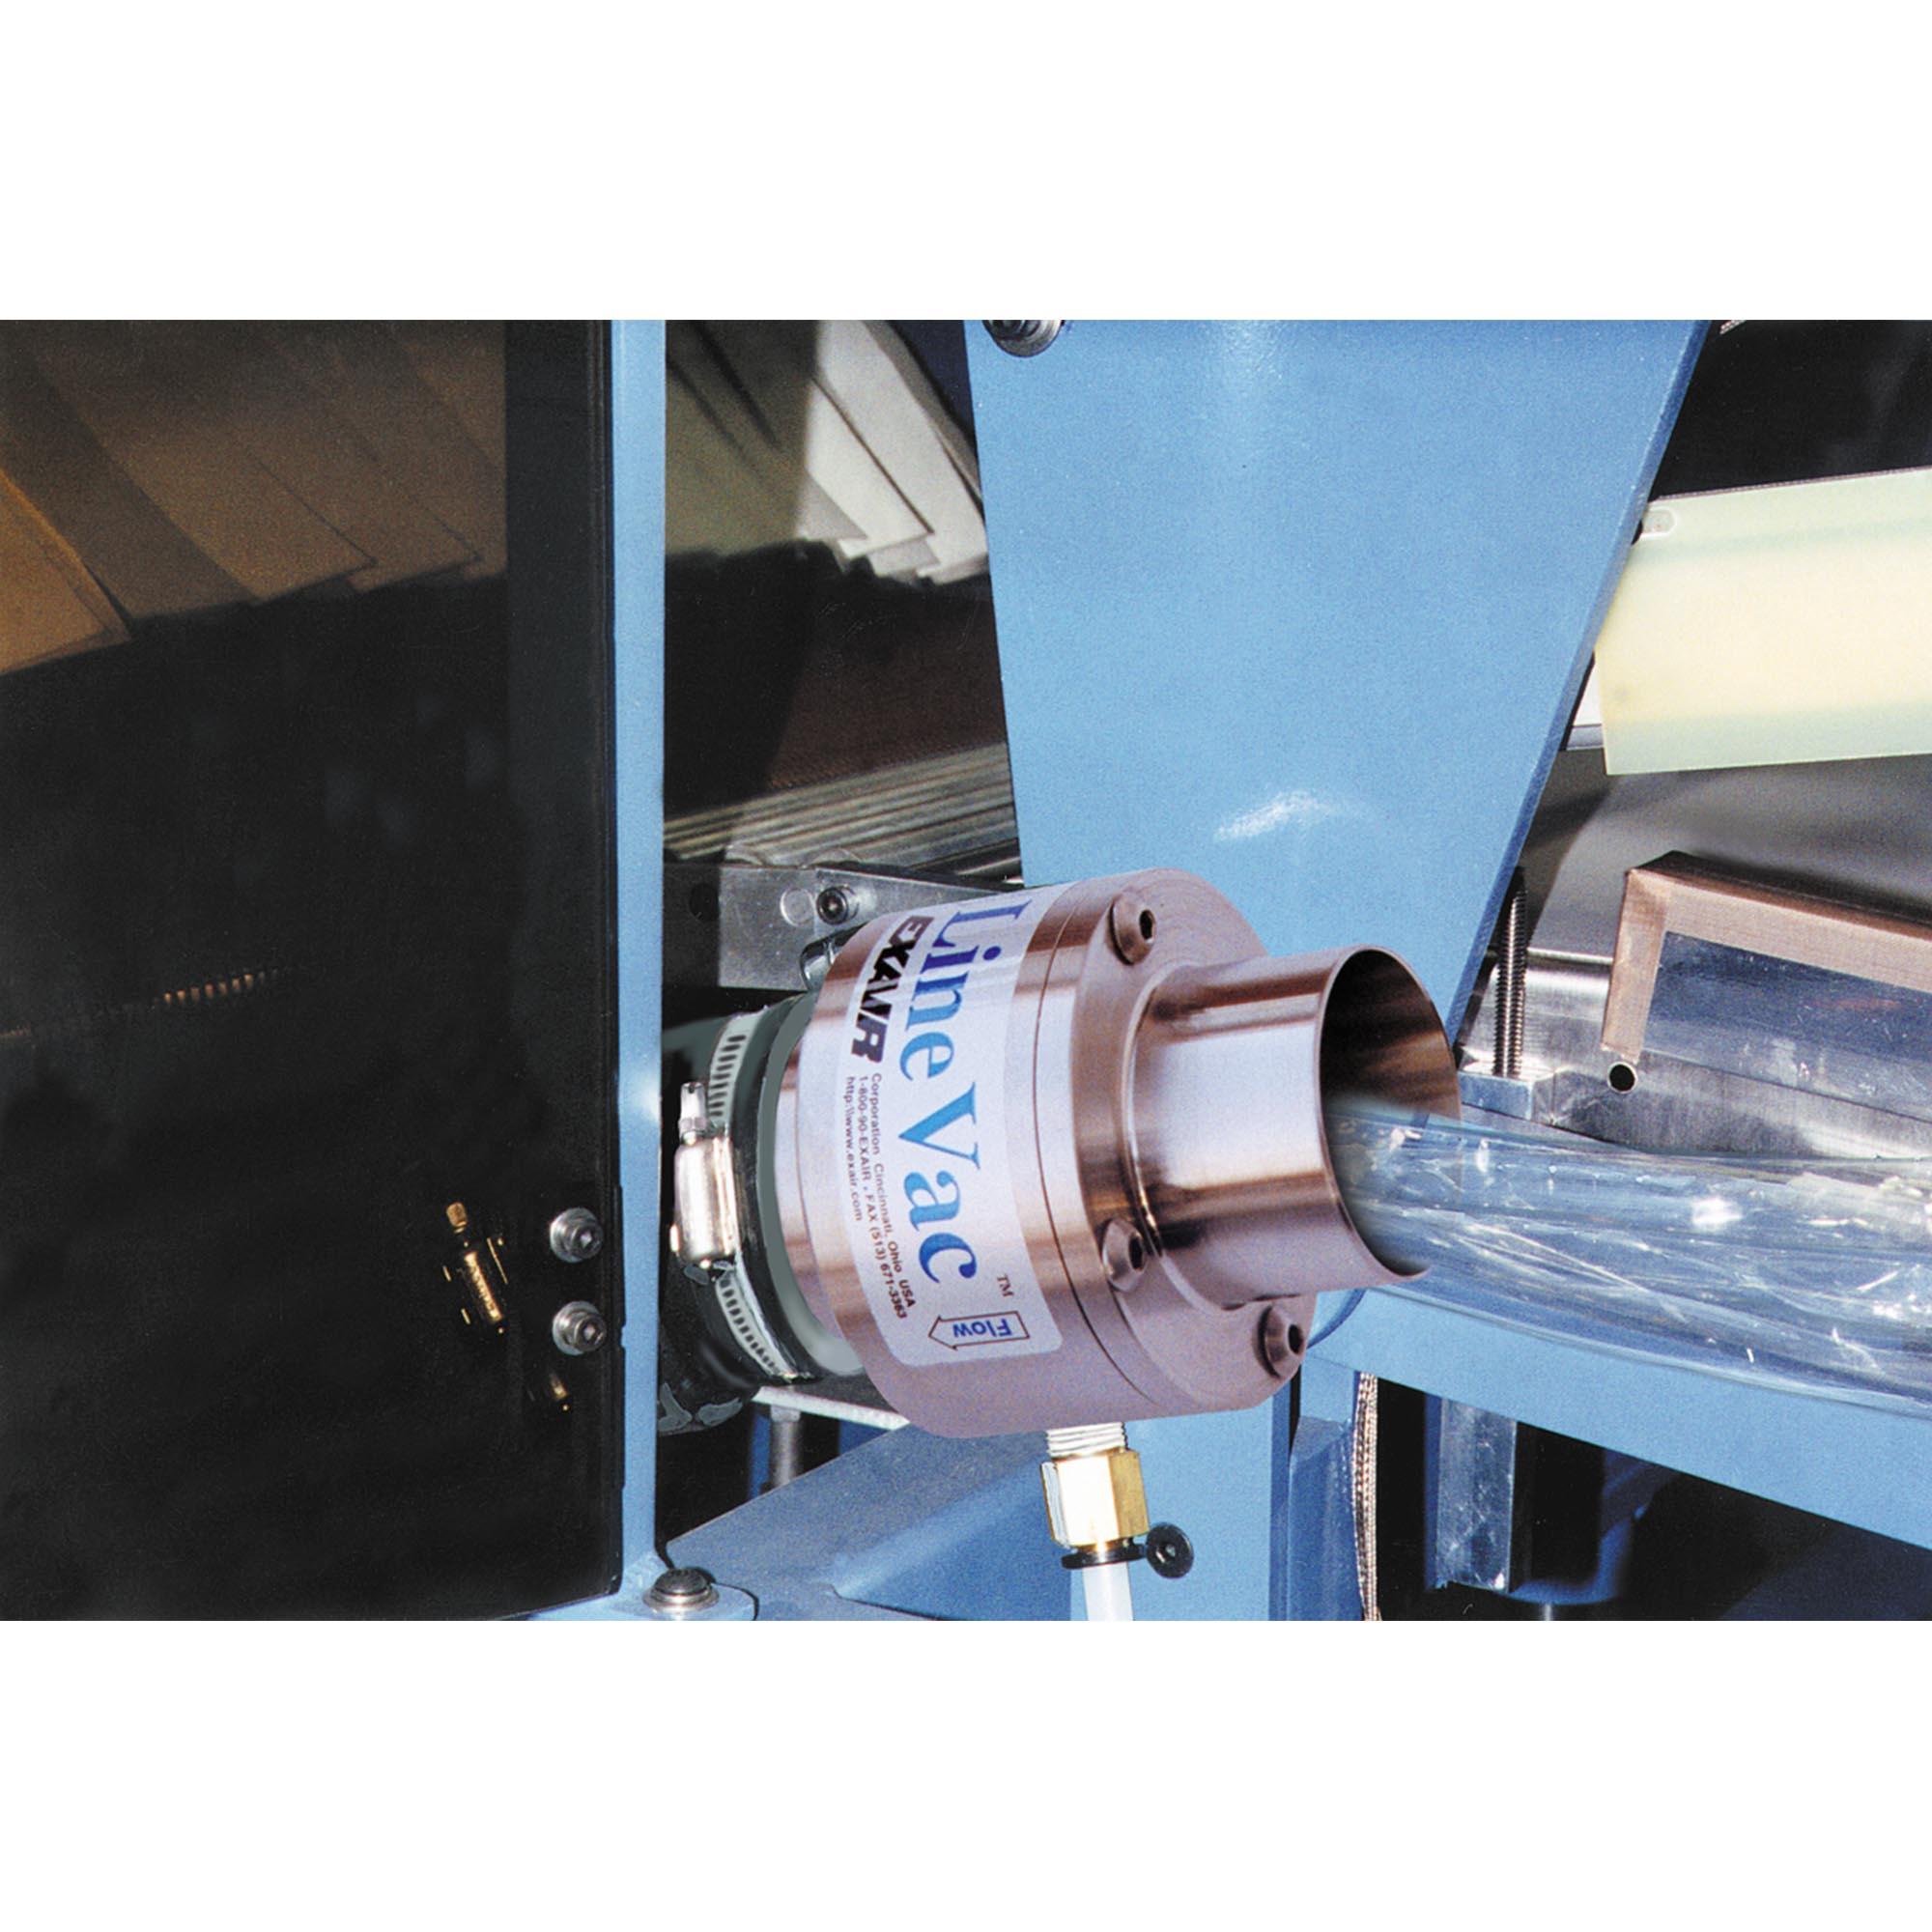 "A Model 6084 2"" (51mm) Line Vac transports scrap cellophane trim to a waste barrel."